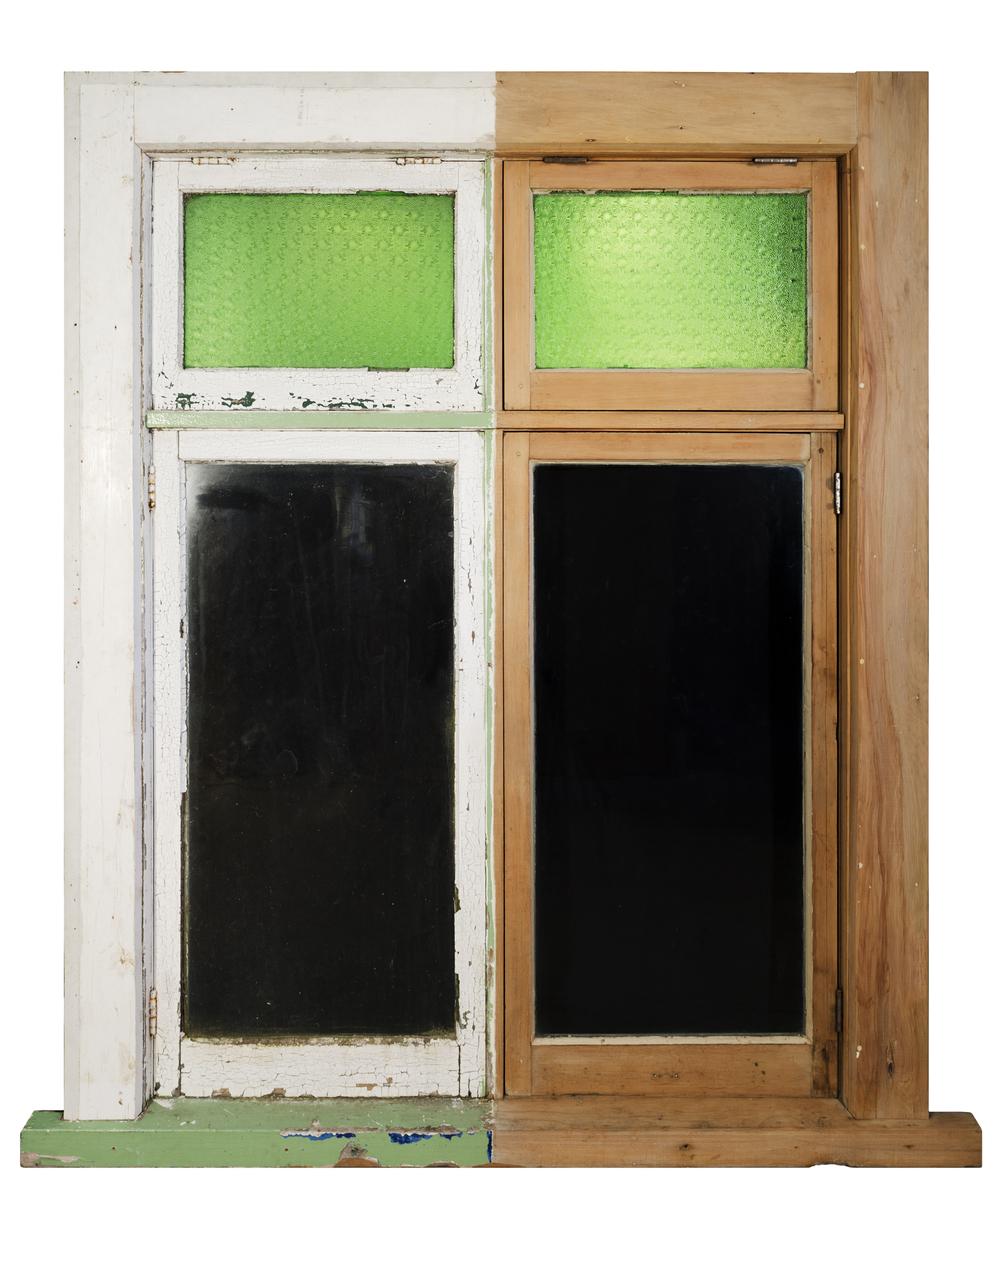 Exterior Window Half Stripped